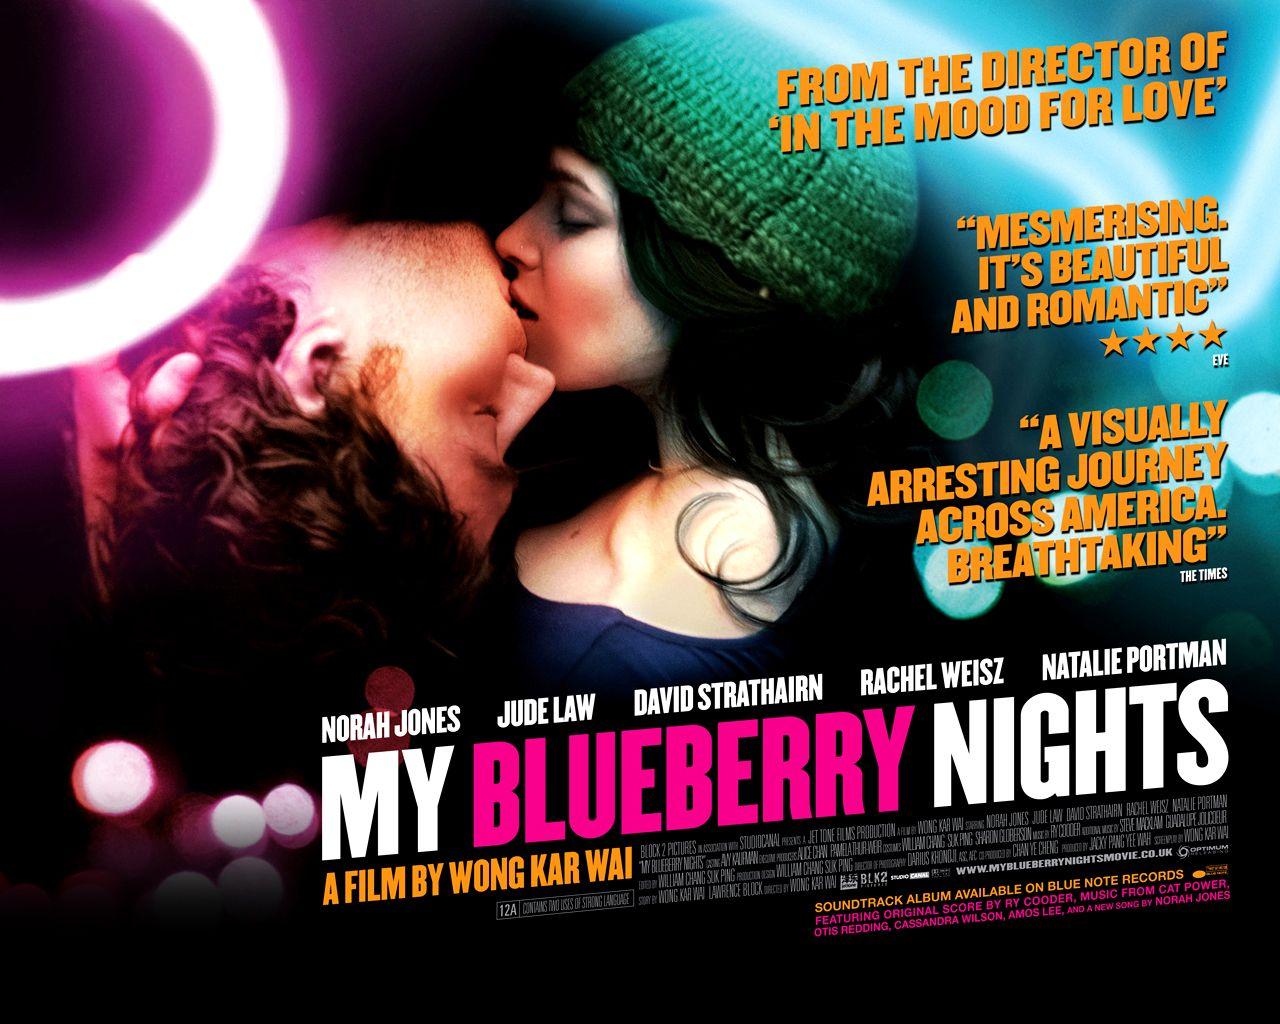 My Blueberry Nights Stream